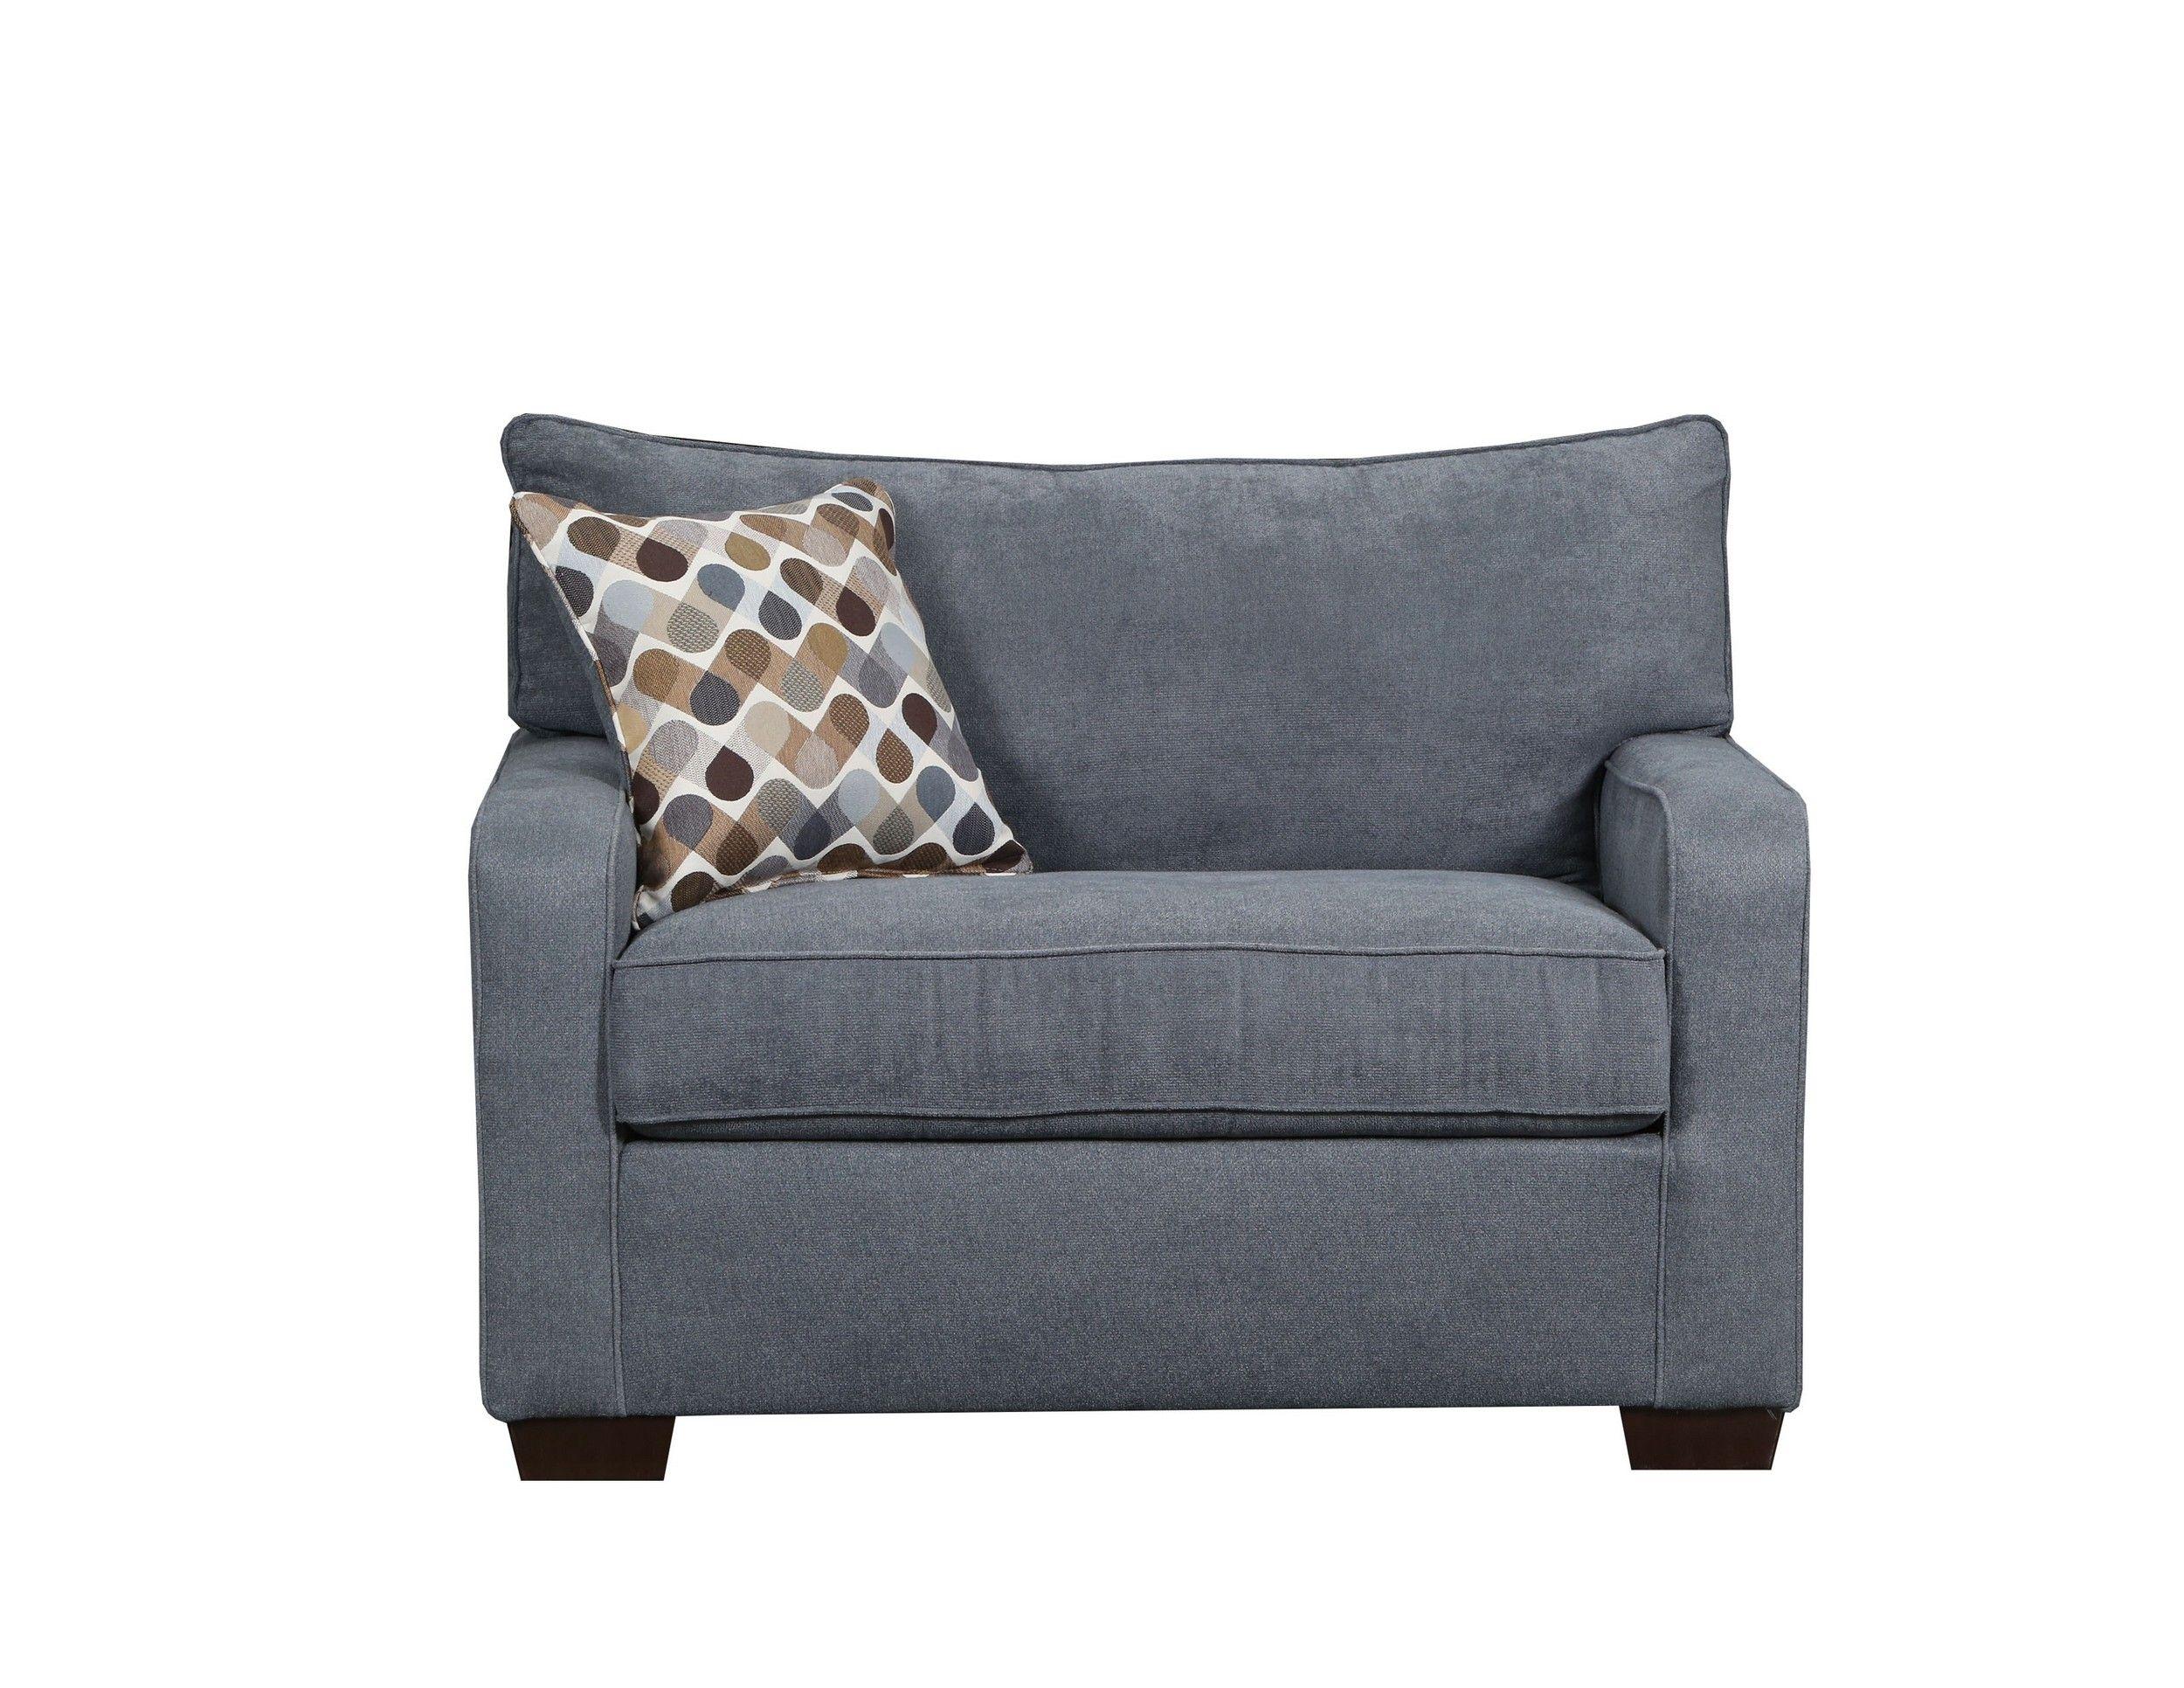 Lowest Price On Simmons Upholstery Mia Denim Mini Sleeper Chair 9025 01m Mia Denim Shop Today Sleeper Sofa Living Room Sets Living Room Sofa